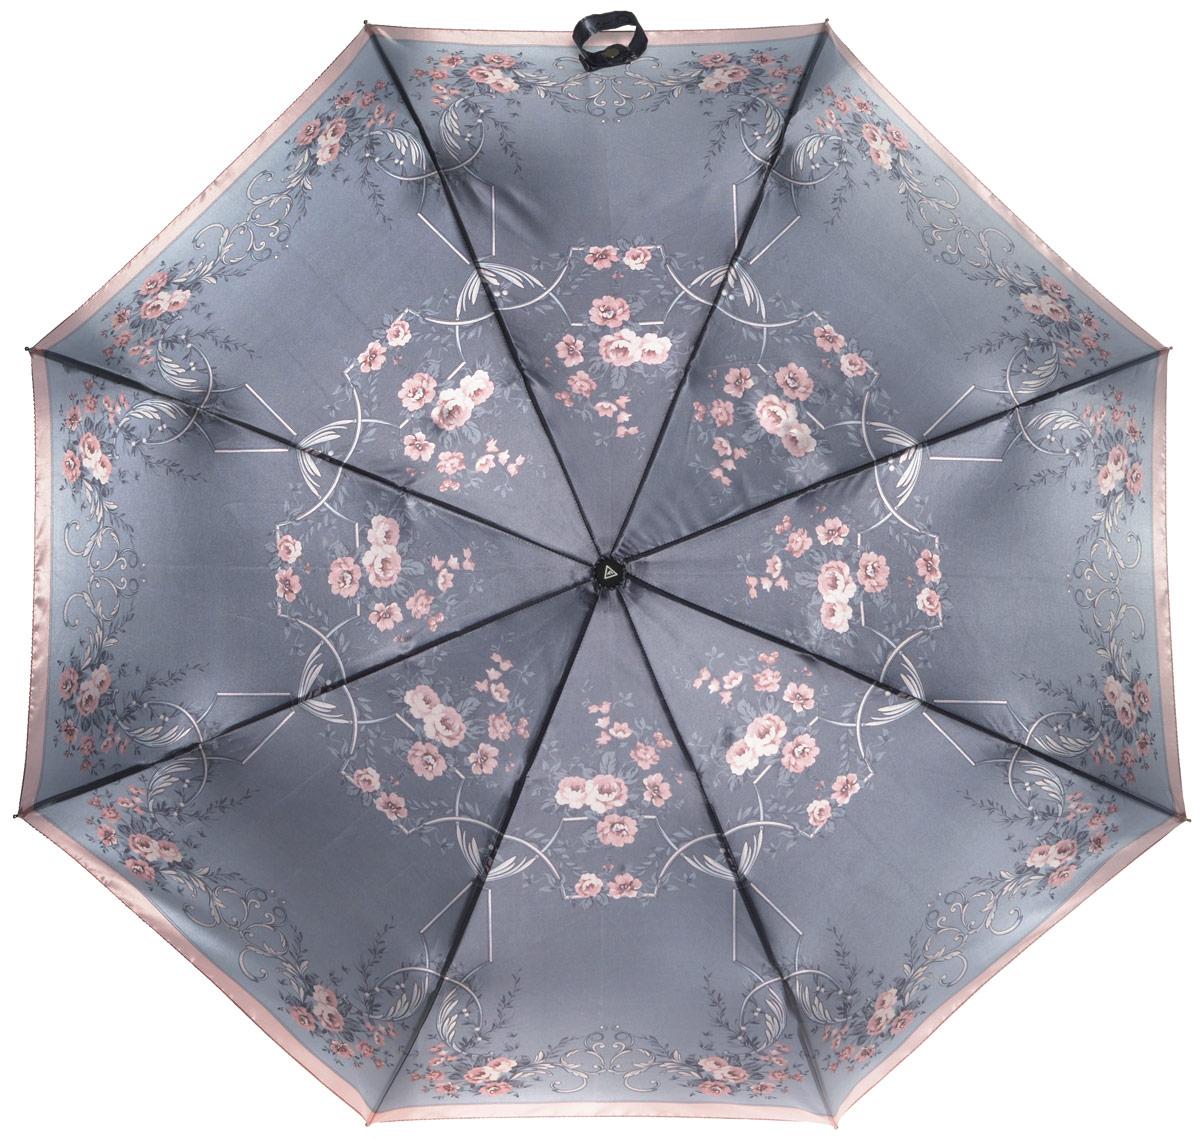 Зонт женский Fabretti, автомат, 3 сложения. L-16104-17L-16104-17Зонт женский Fabretti, облегченный суперавтомат, 3 сложения